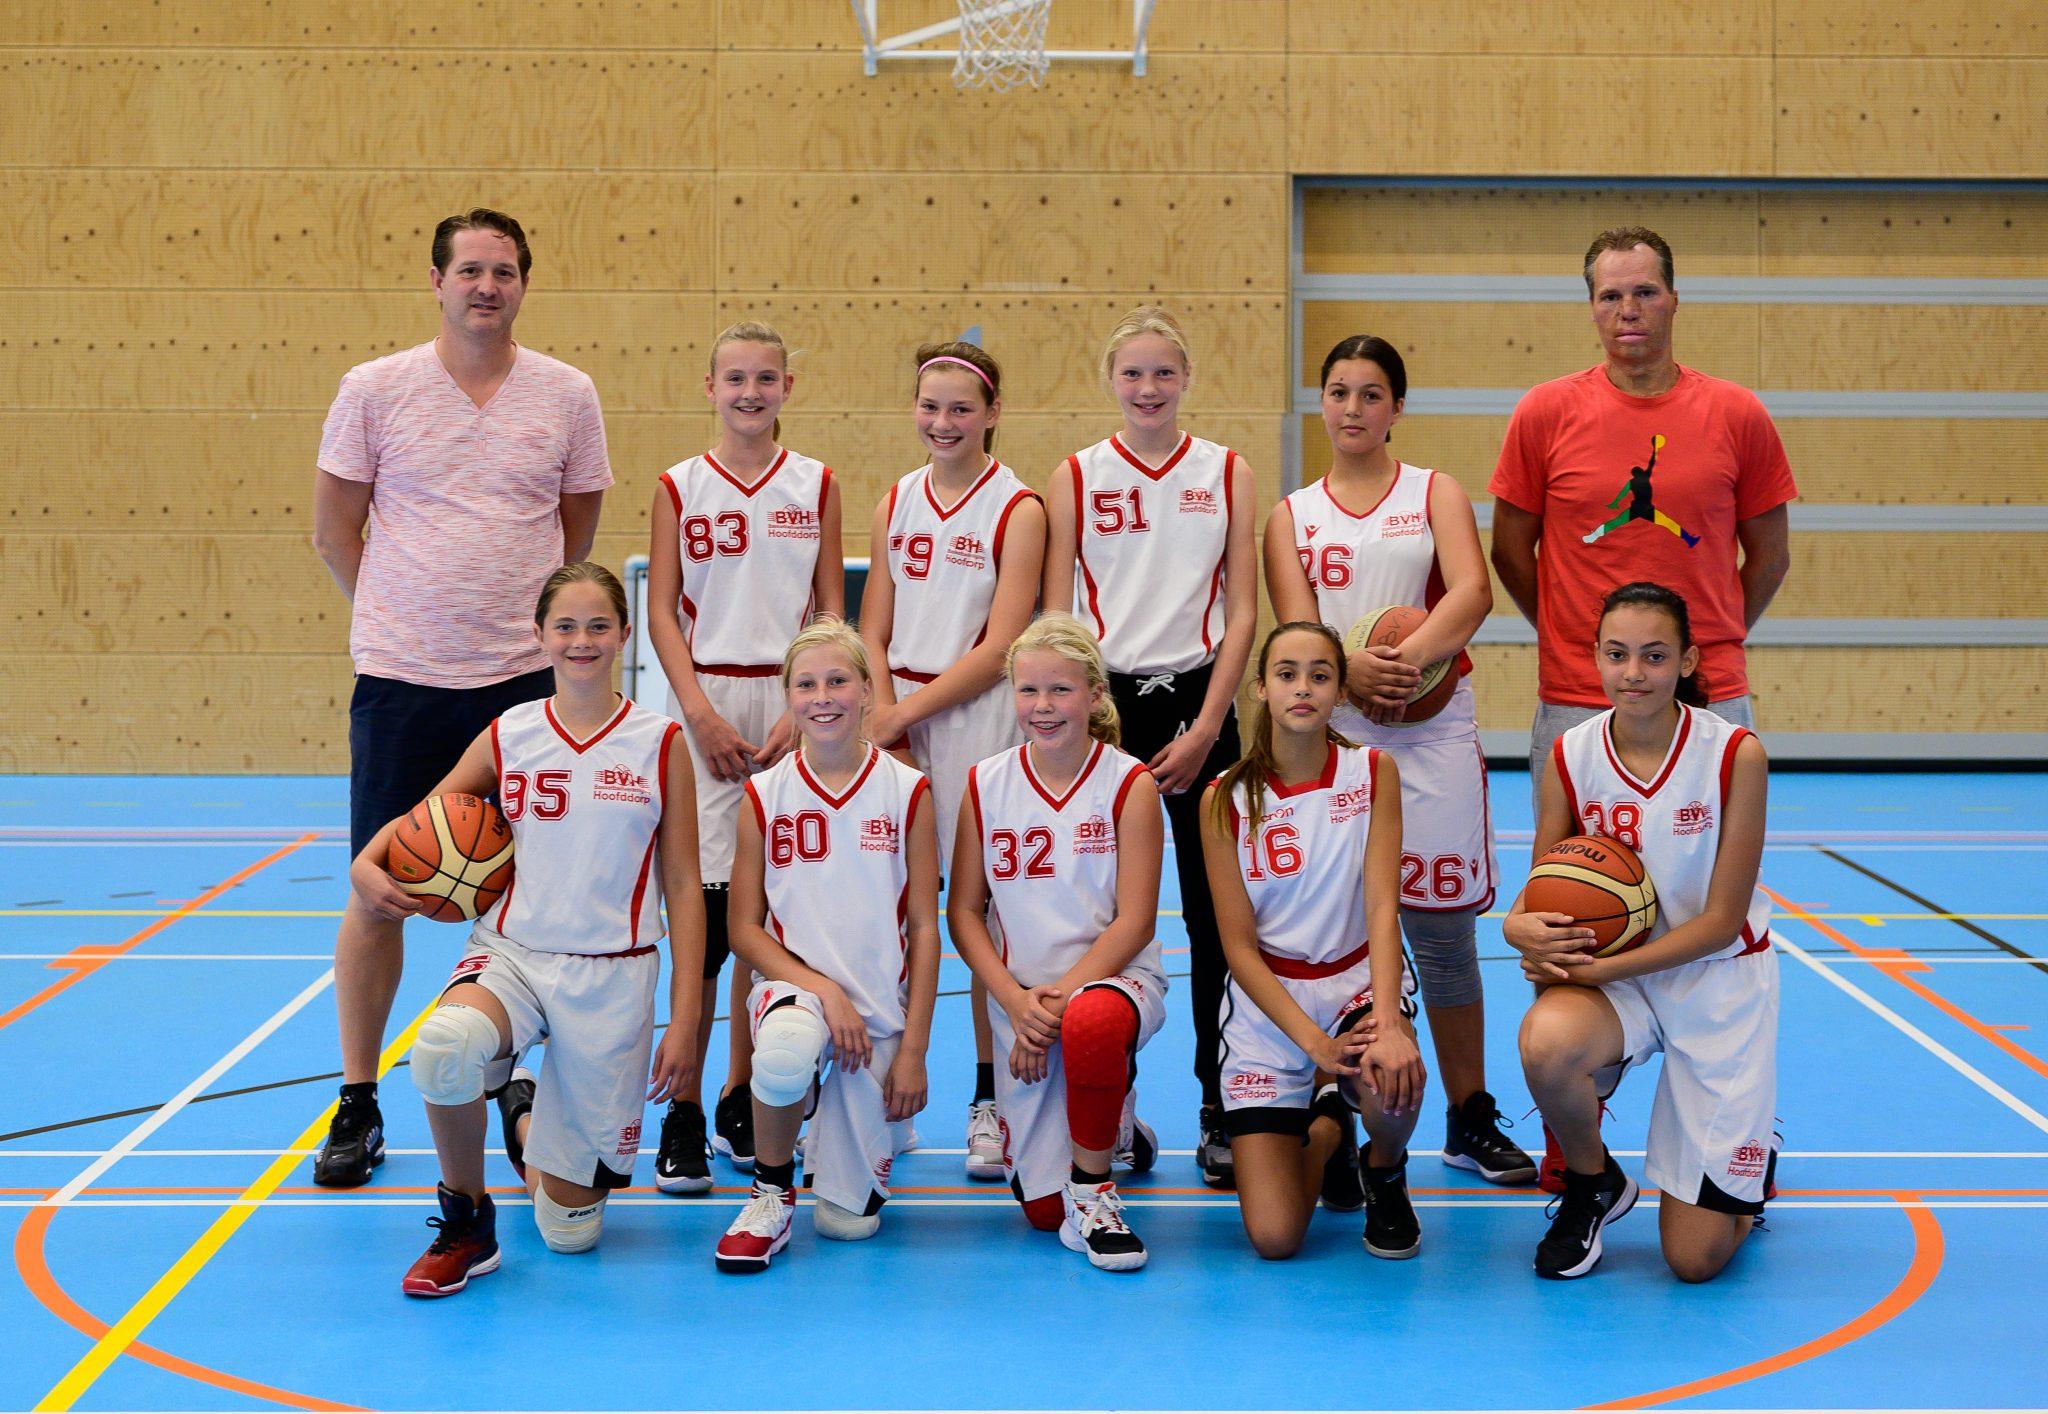 Teamfoto BV Hoofddorp V14 1